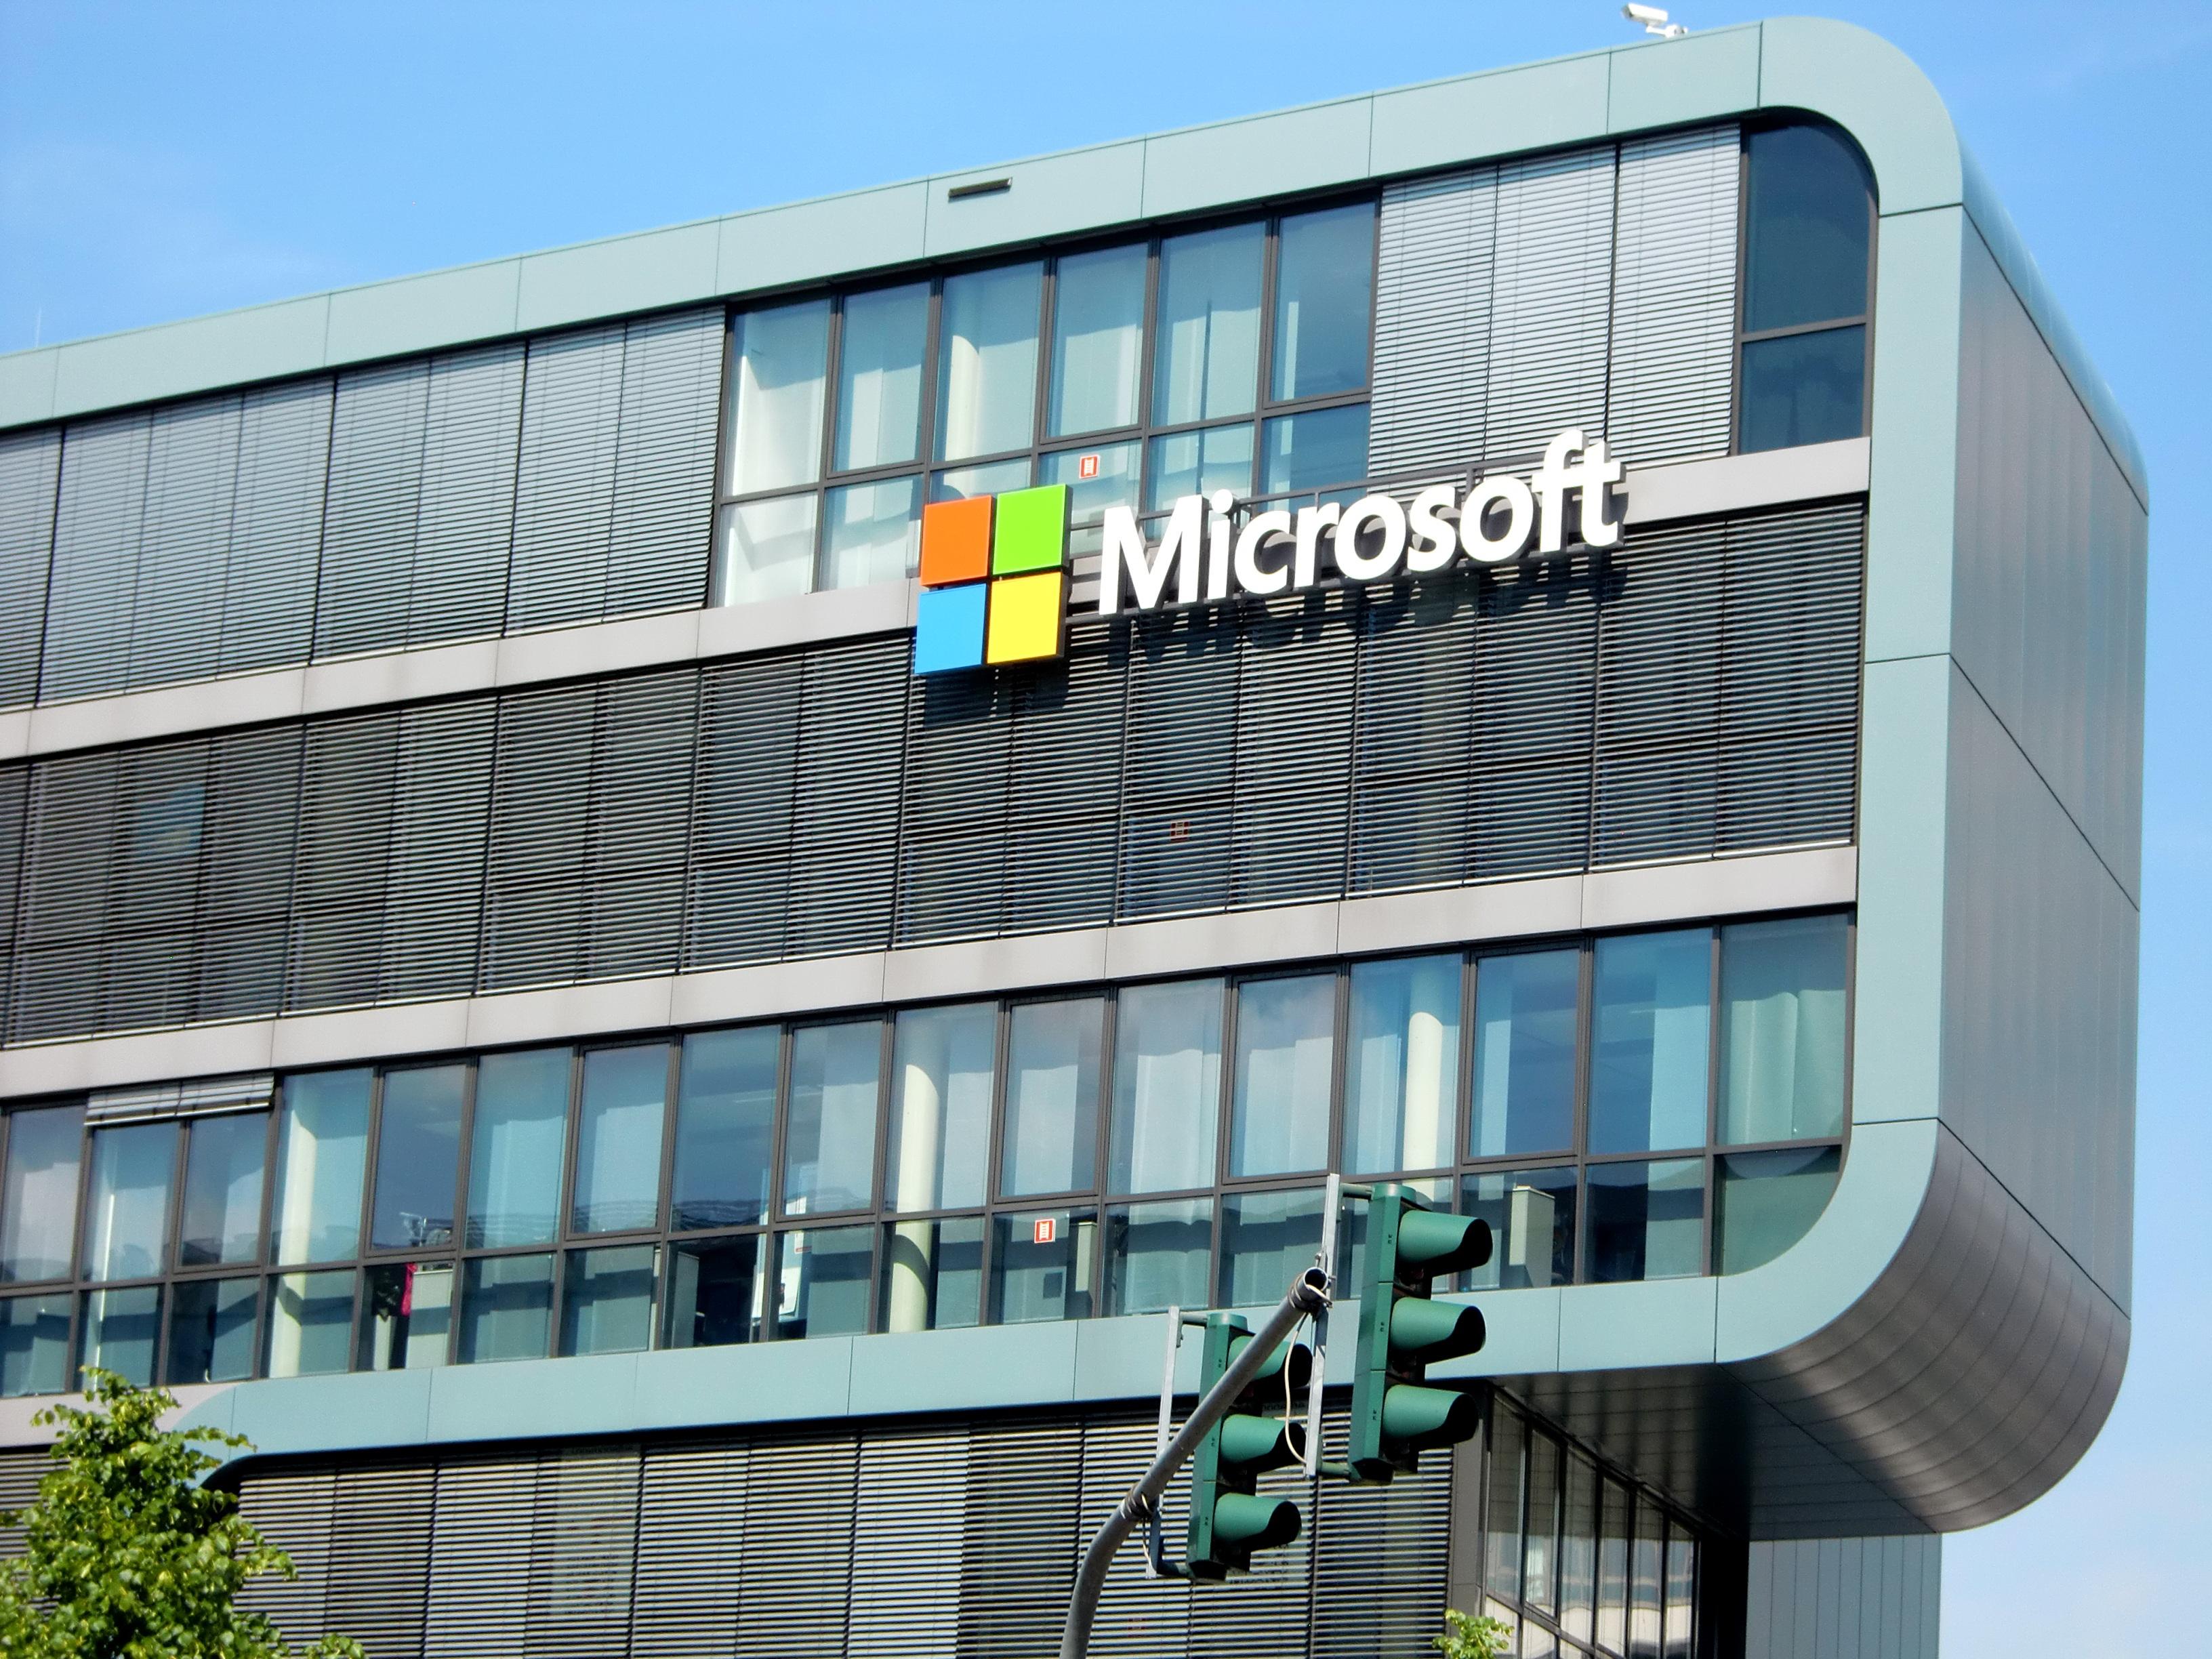 Microsoft_buildings_EU.jpg